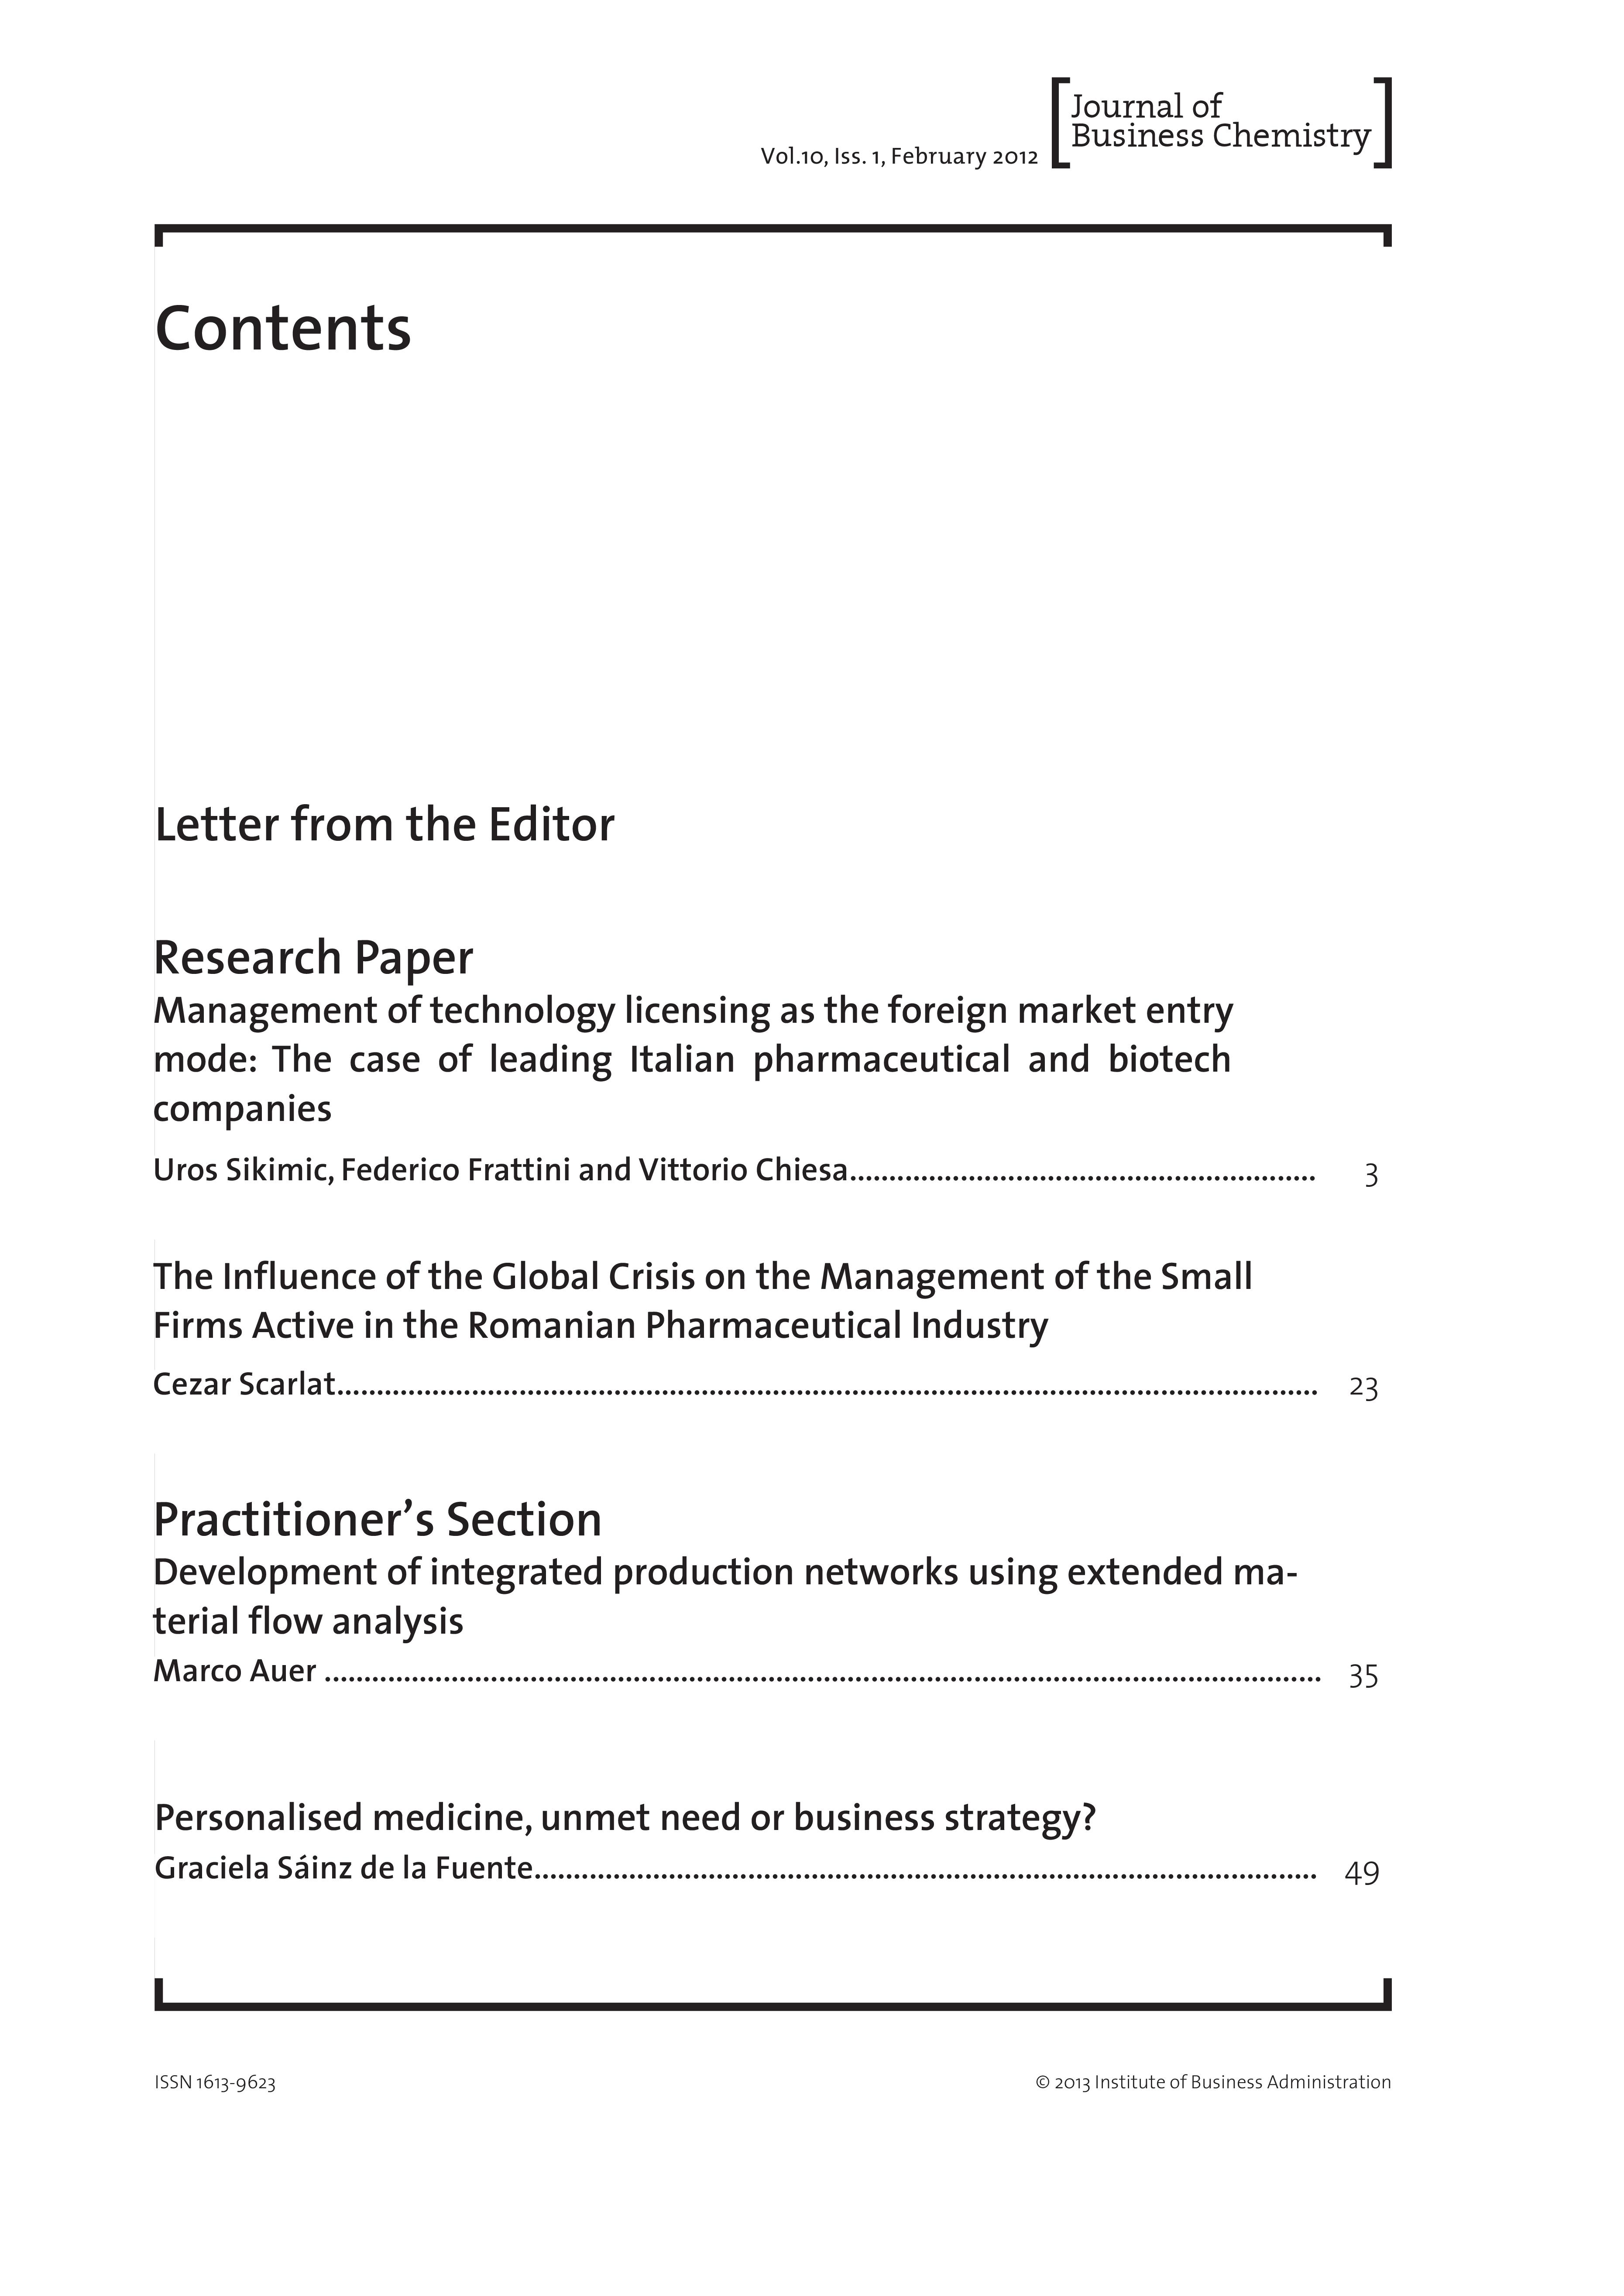 Journal of Business Chemistry February 2013